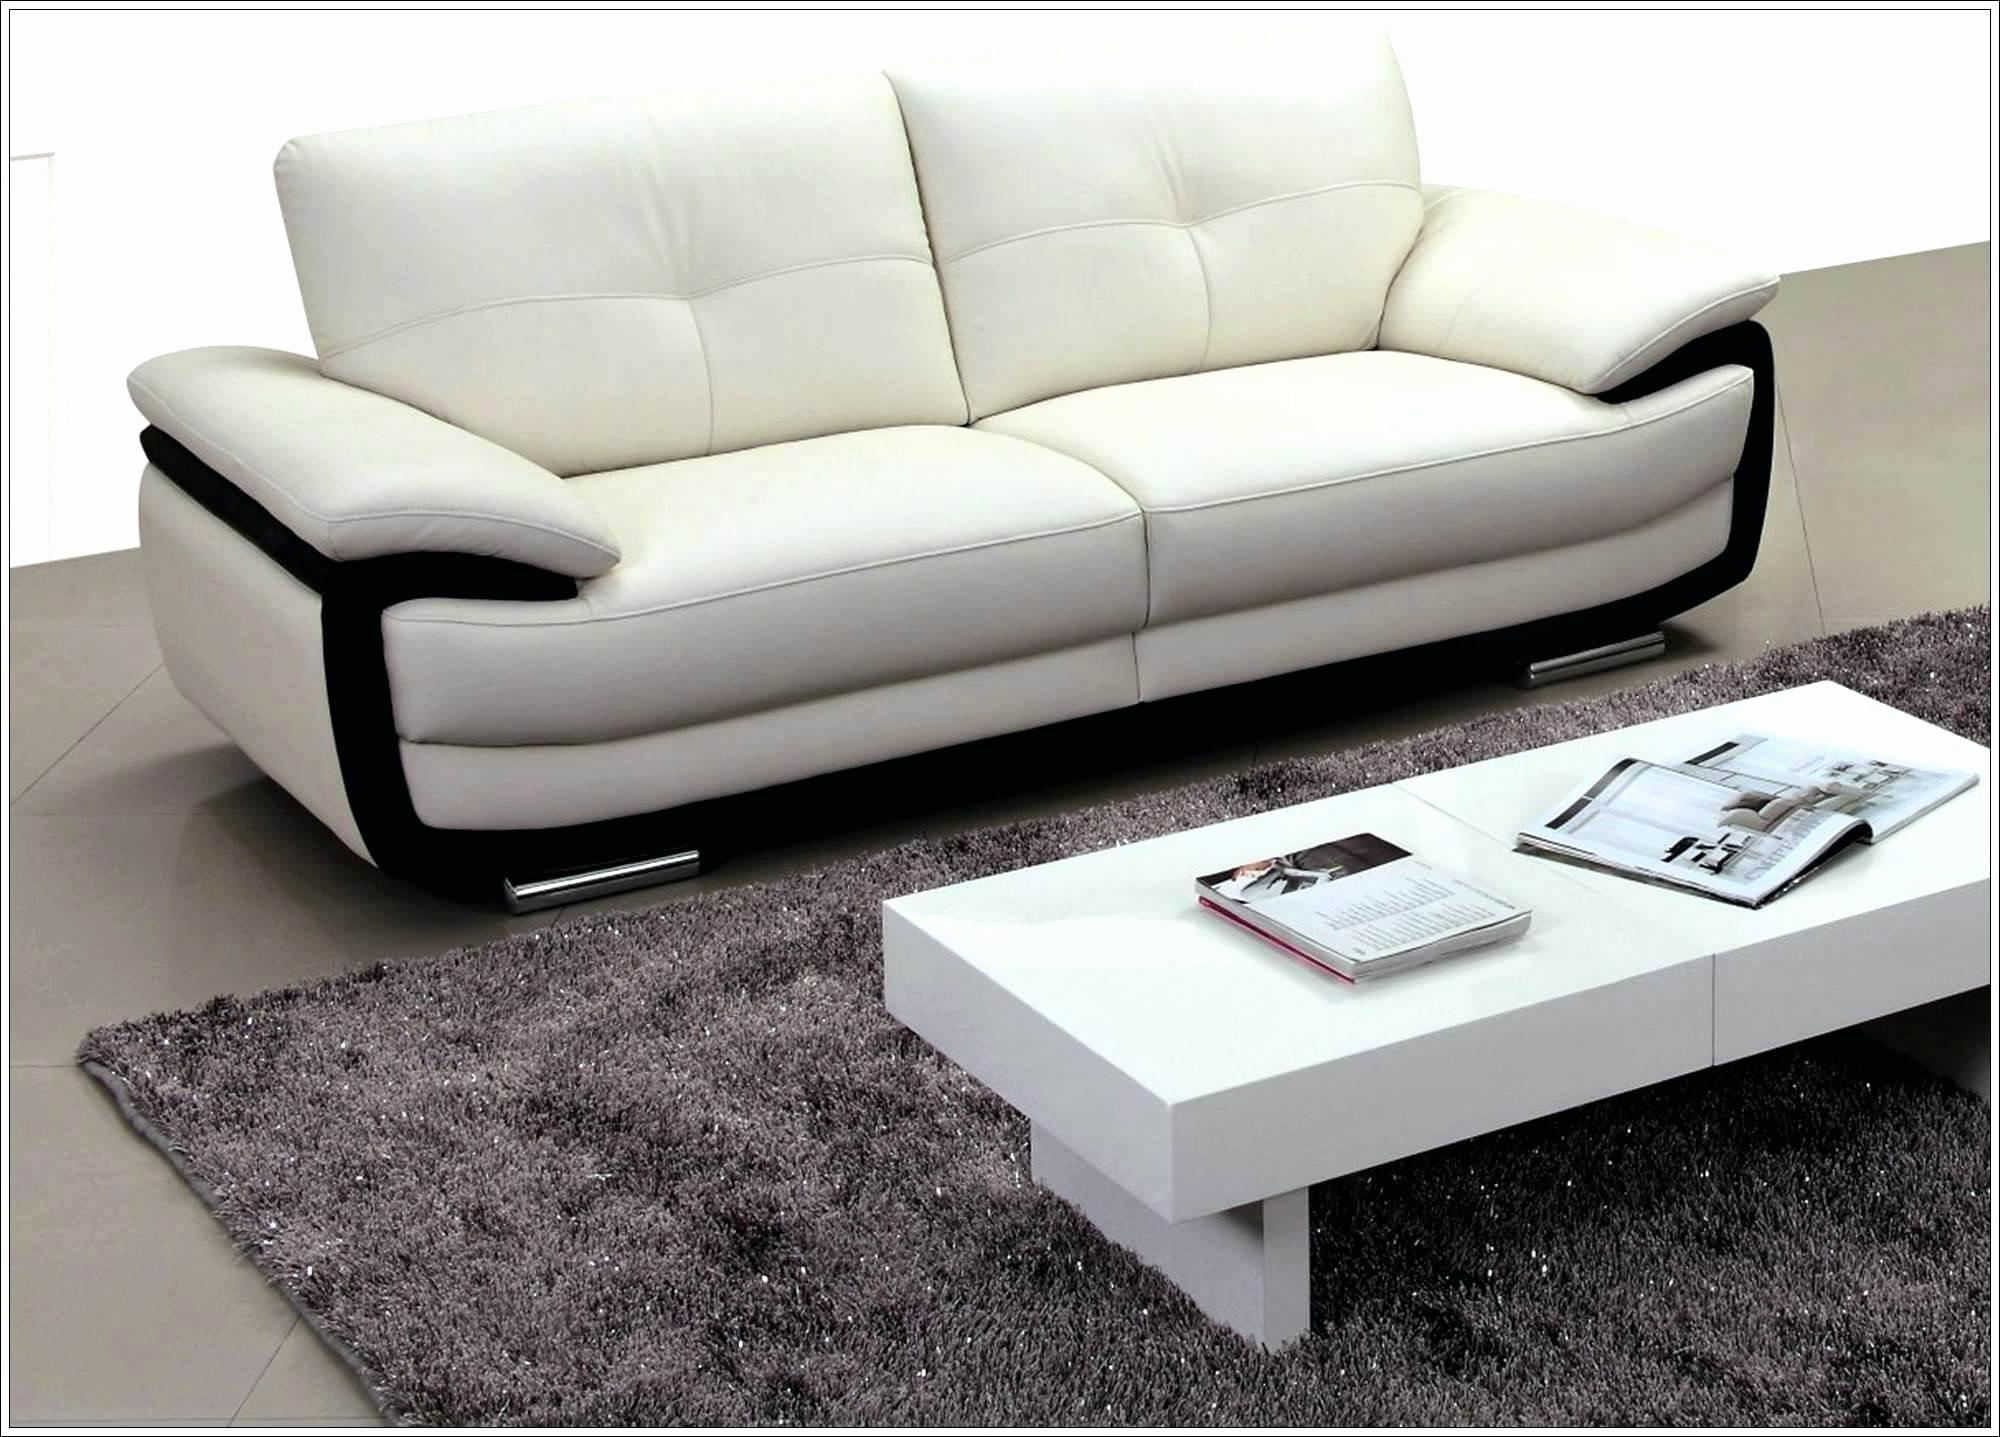 Canapé Angle Alinea Inspirant Stock Canap Convertible 3 Places Conforama 21 Delicieux Canape Set Meuble